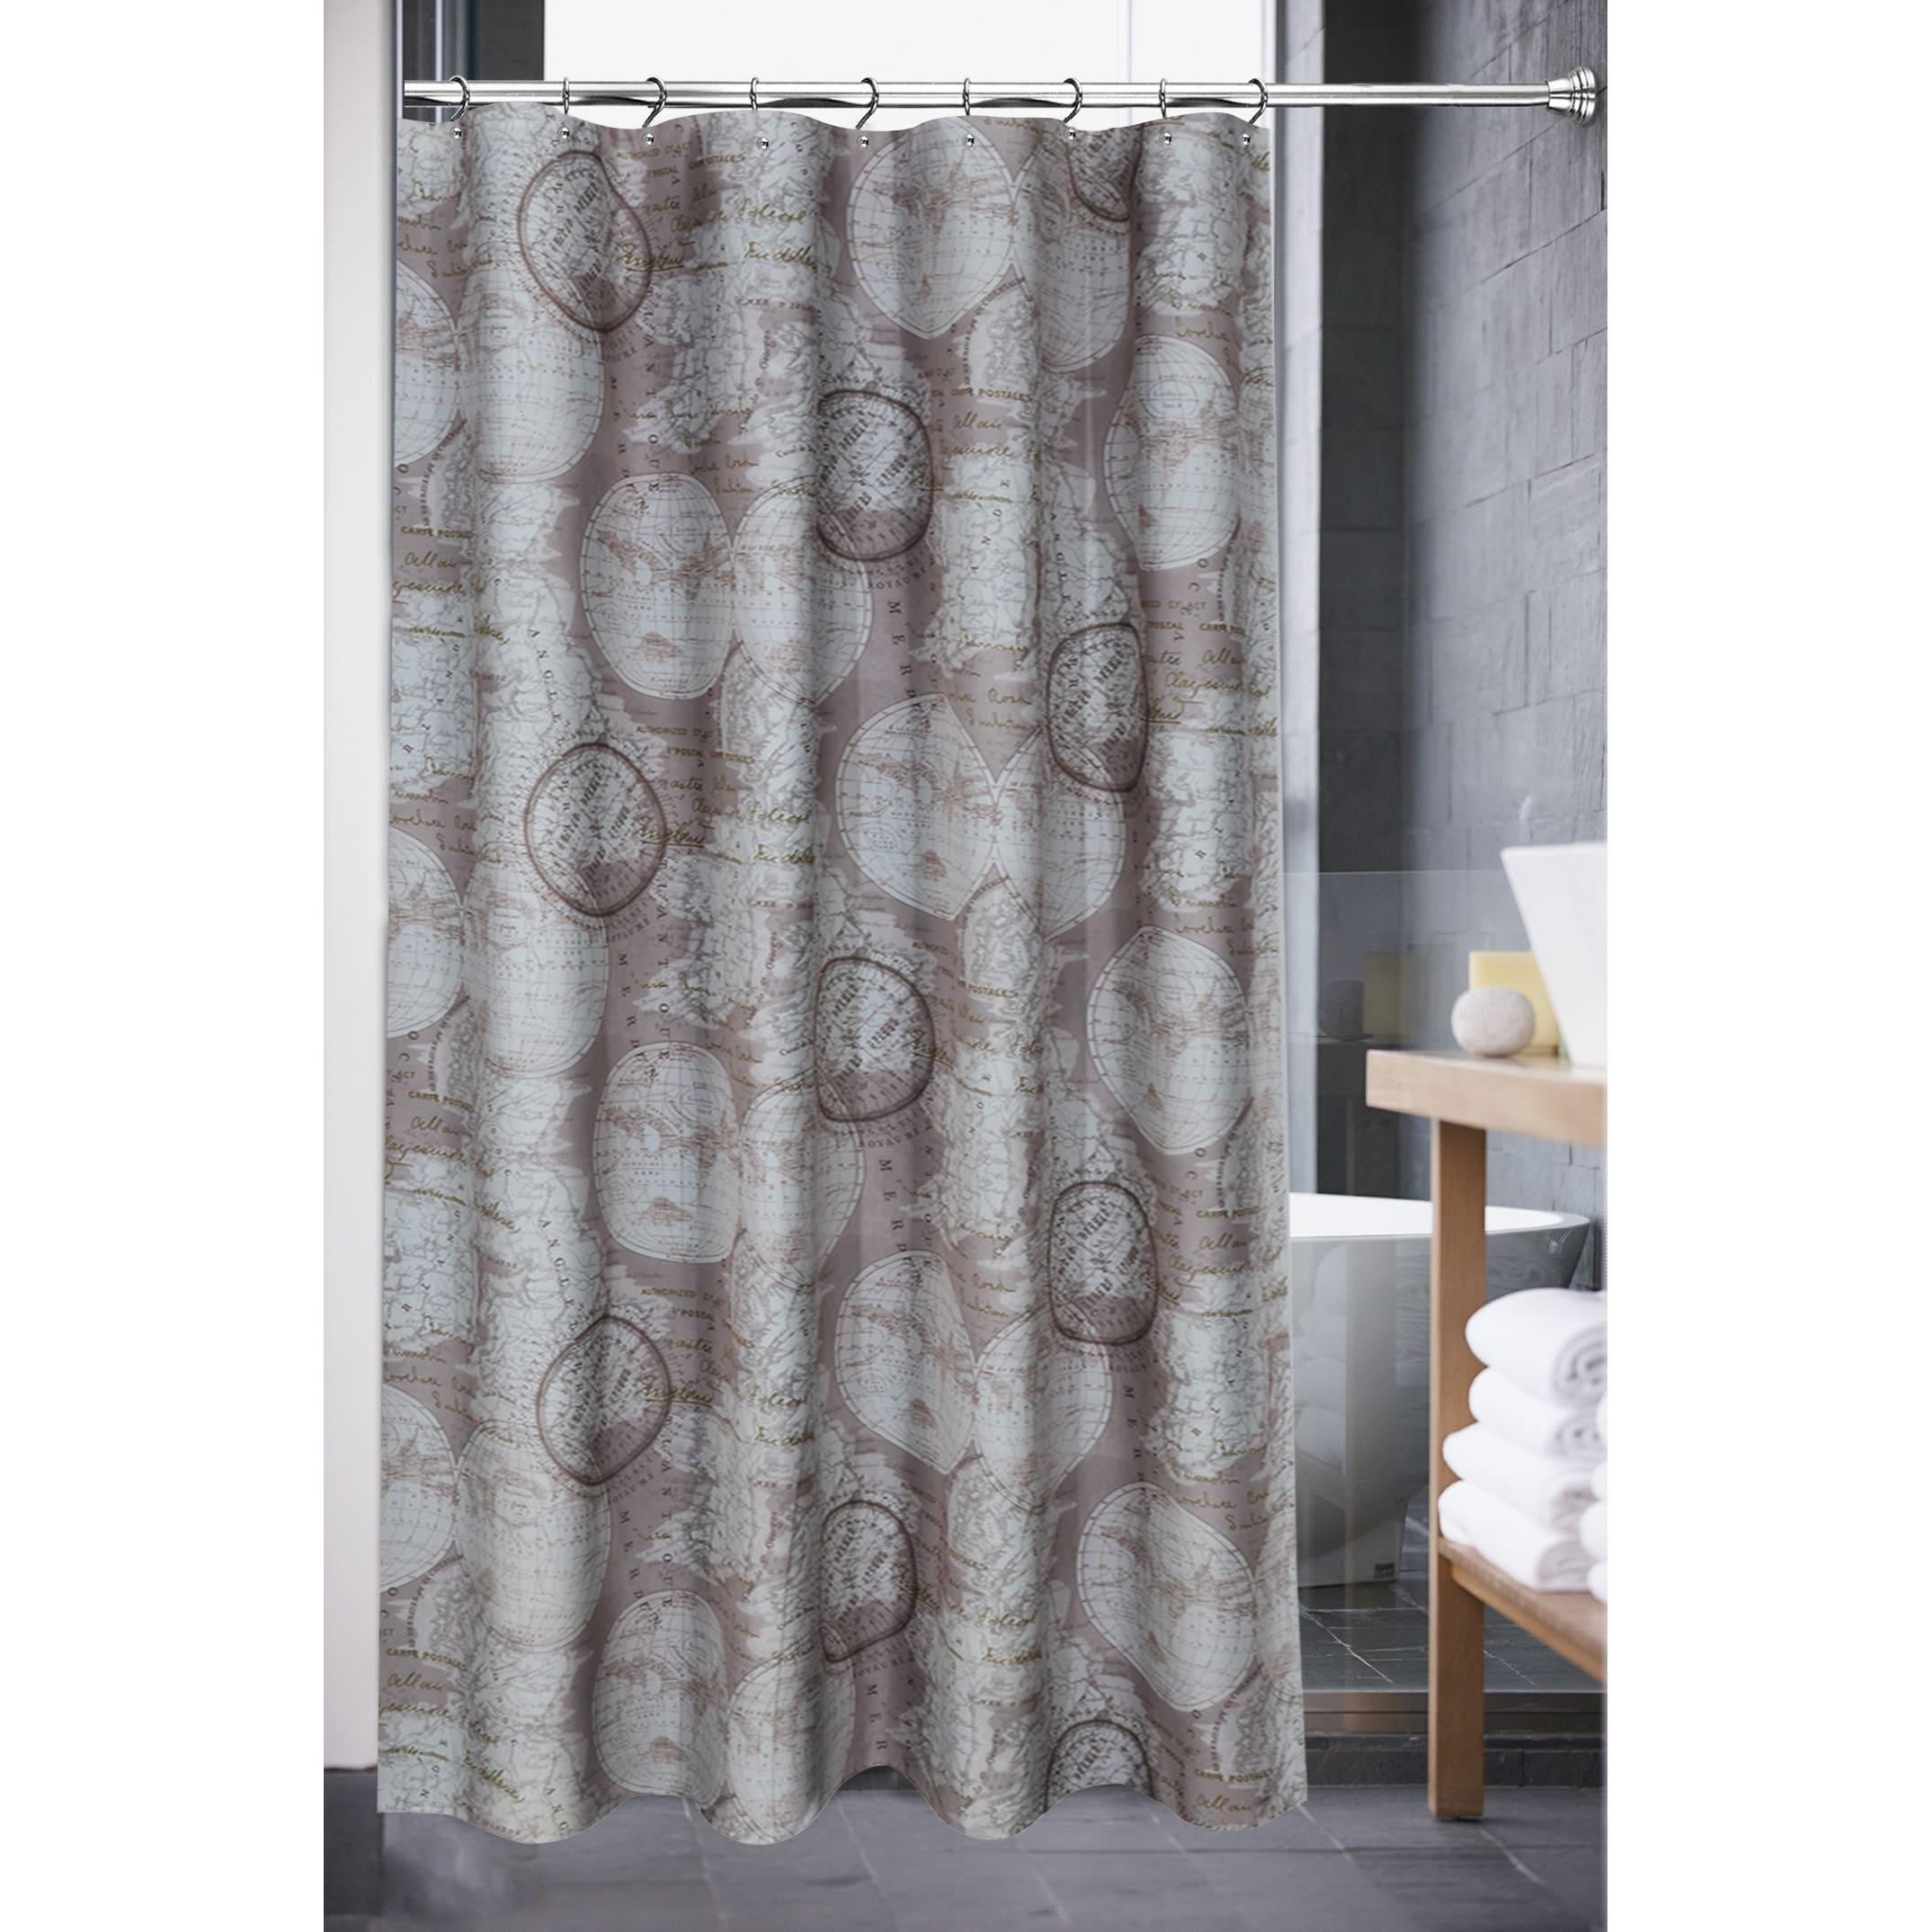 Shop Atlas Shower Curtain